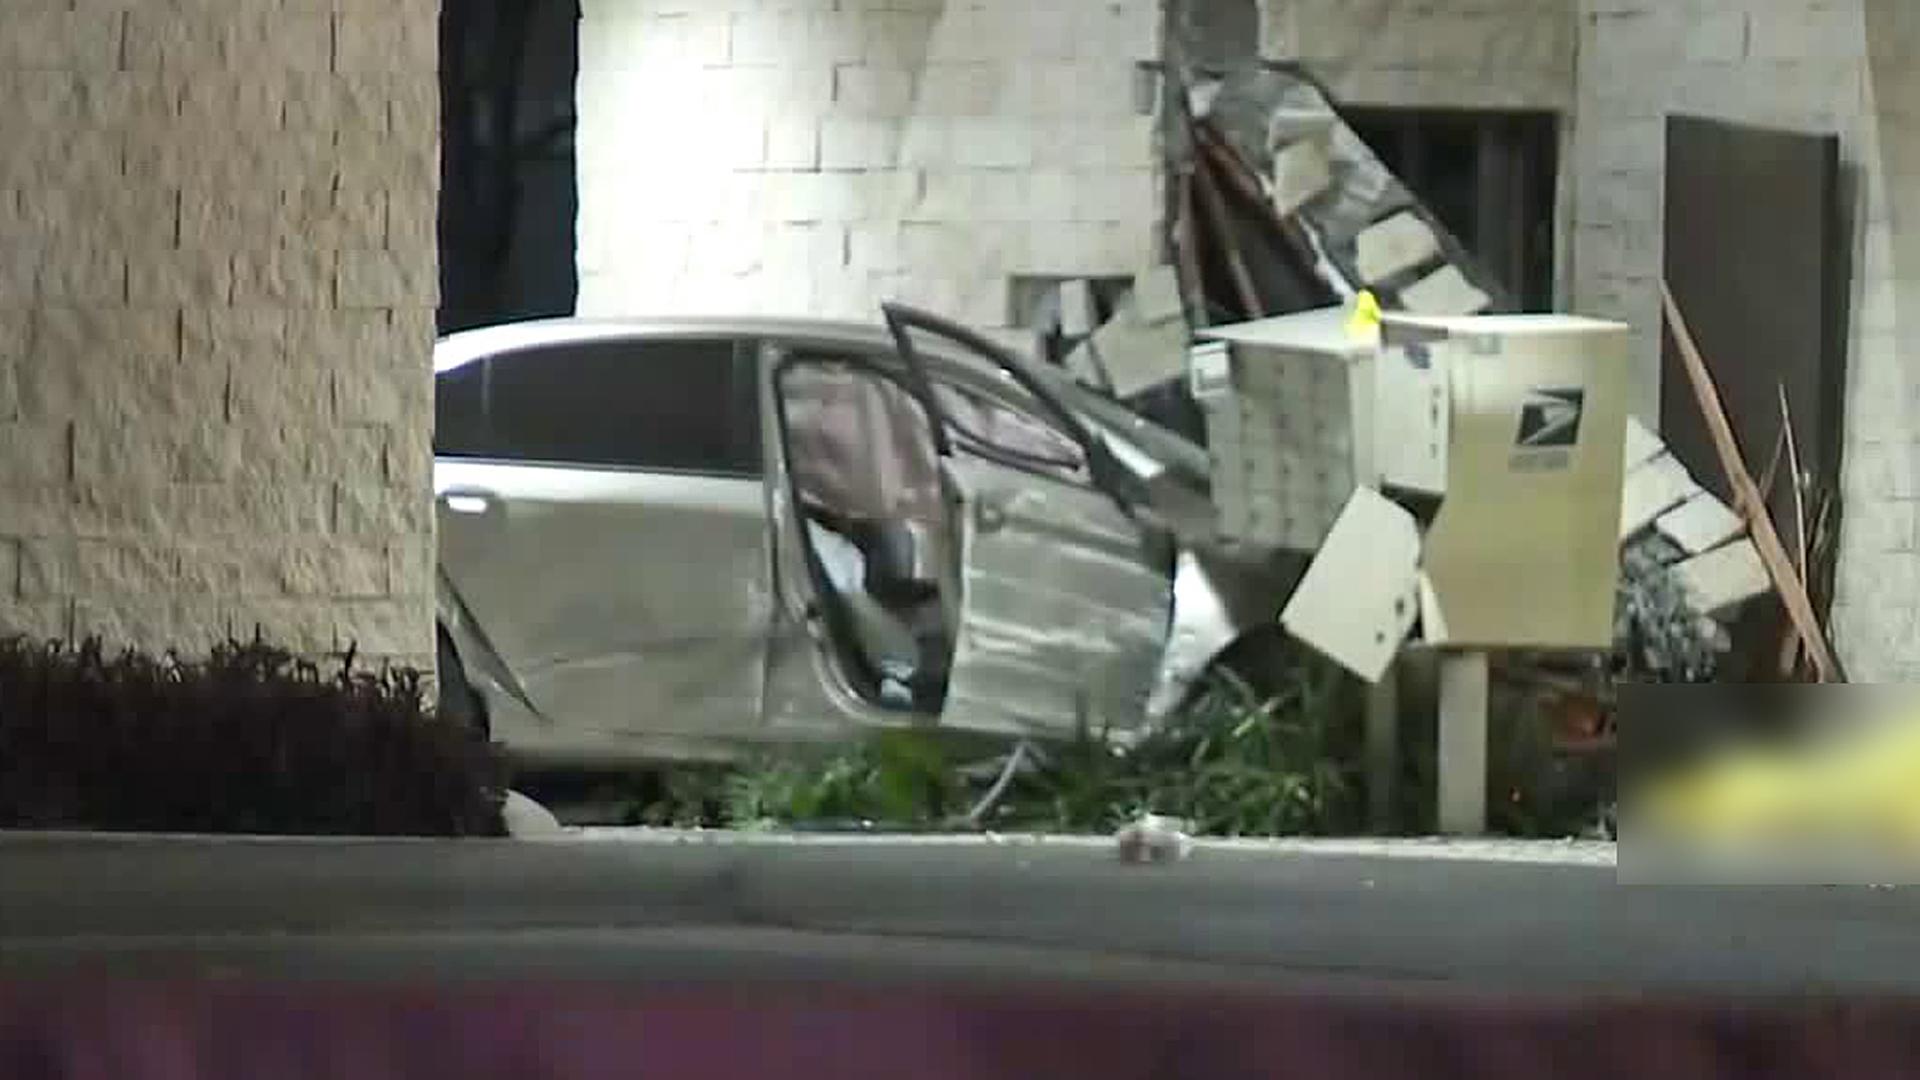 A pursuit ended in a fatal crash in Los Alamitos on March 12, 2020. (KTLA)